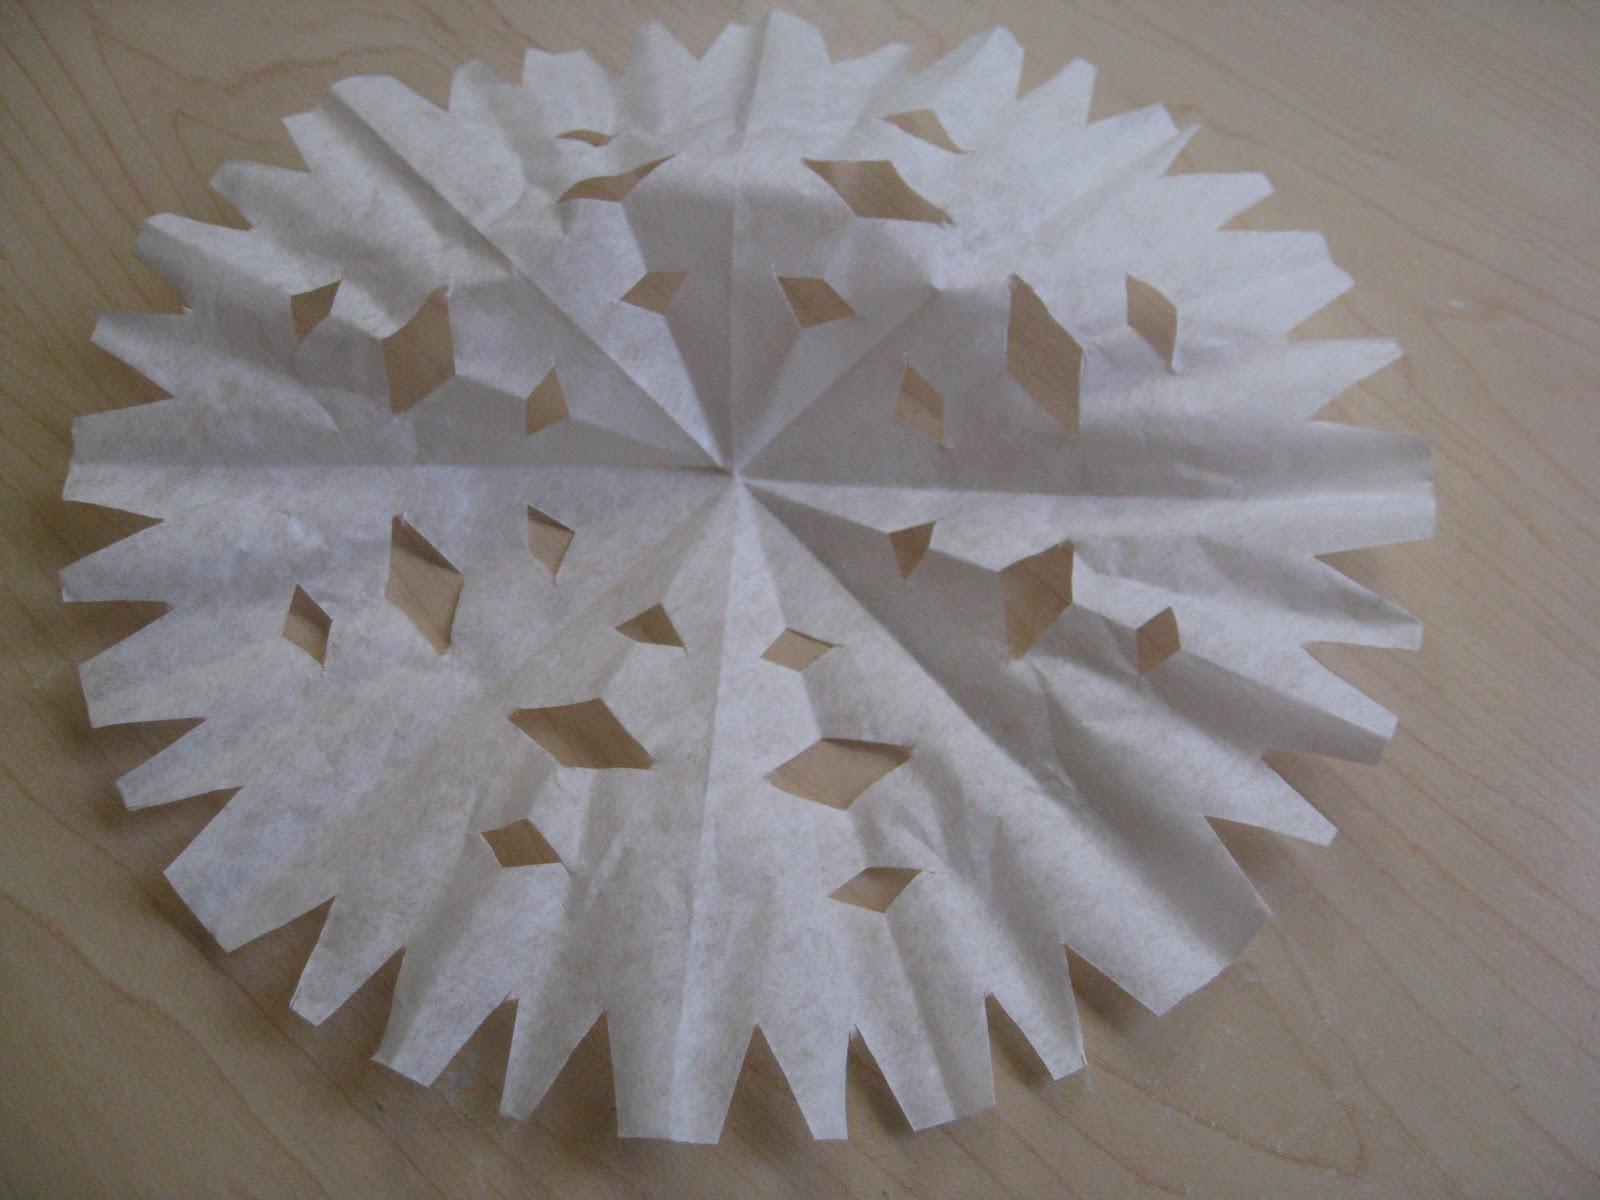 Ot Cafe Scissor Skills Snowflakes